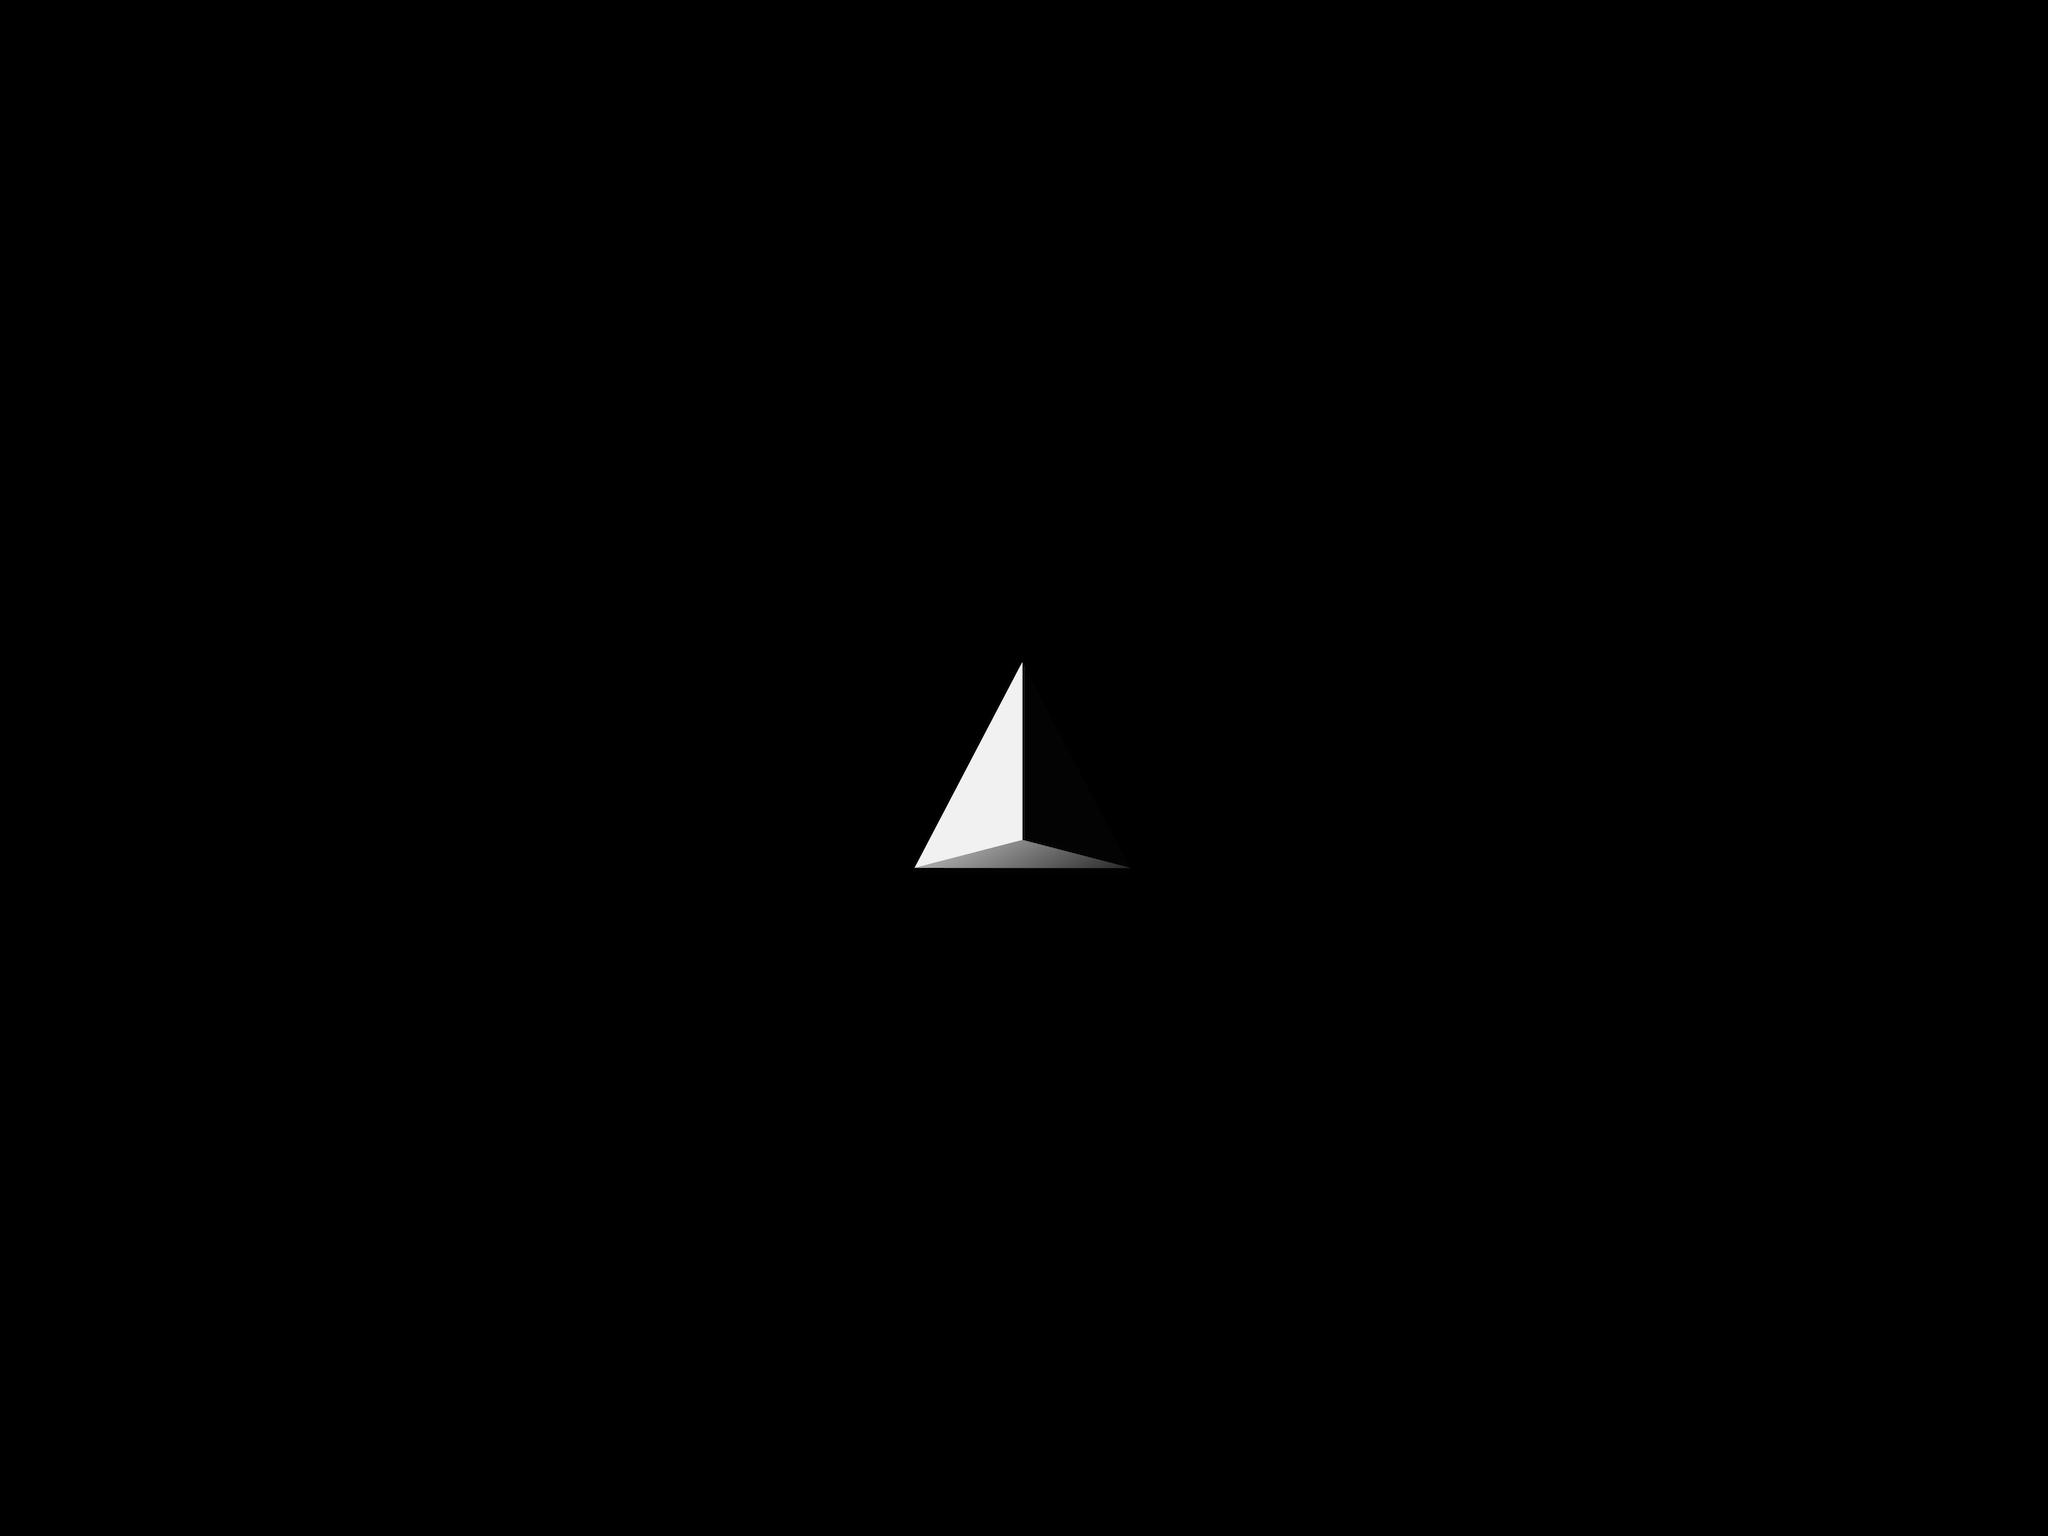 contrib/mobile/iOS/Onelab/Images.xcassets/LaunchImage.launchimage/splash2048x1536.png